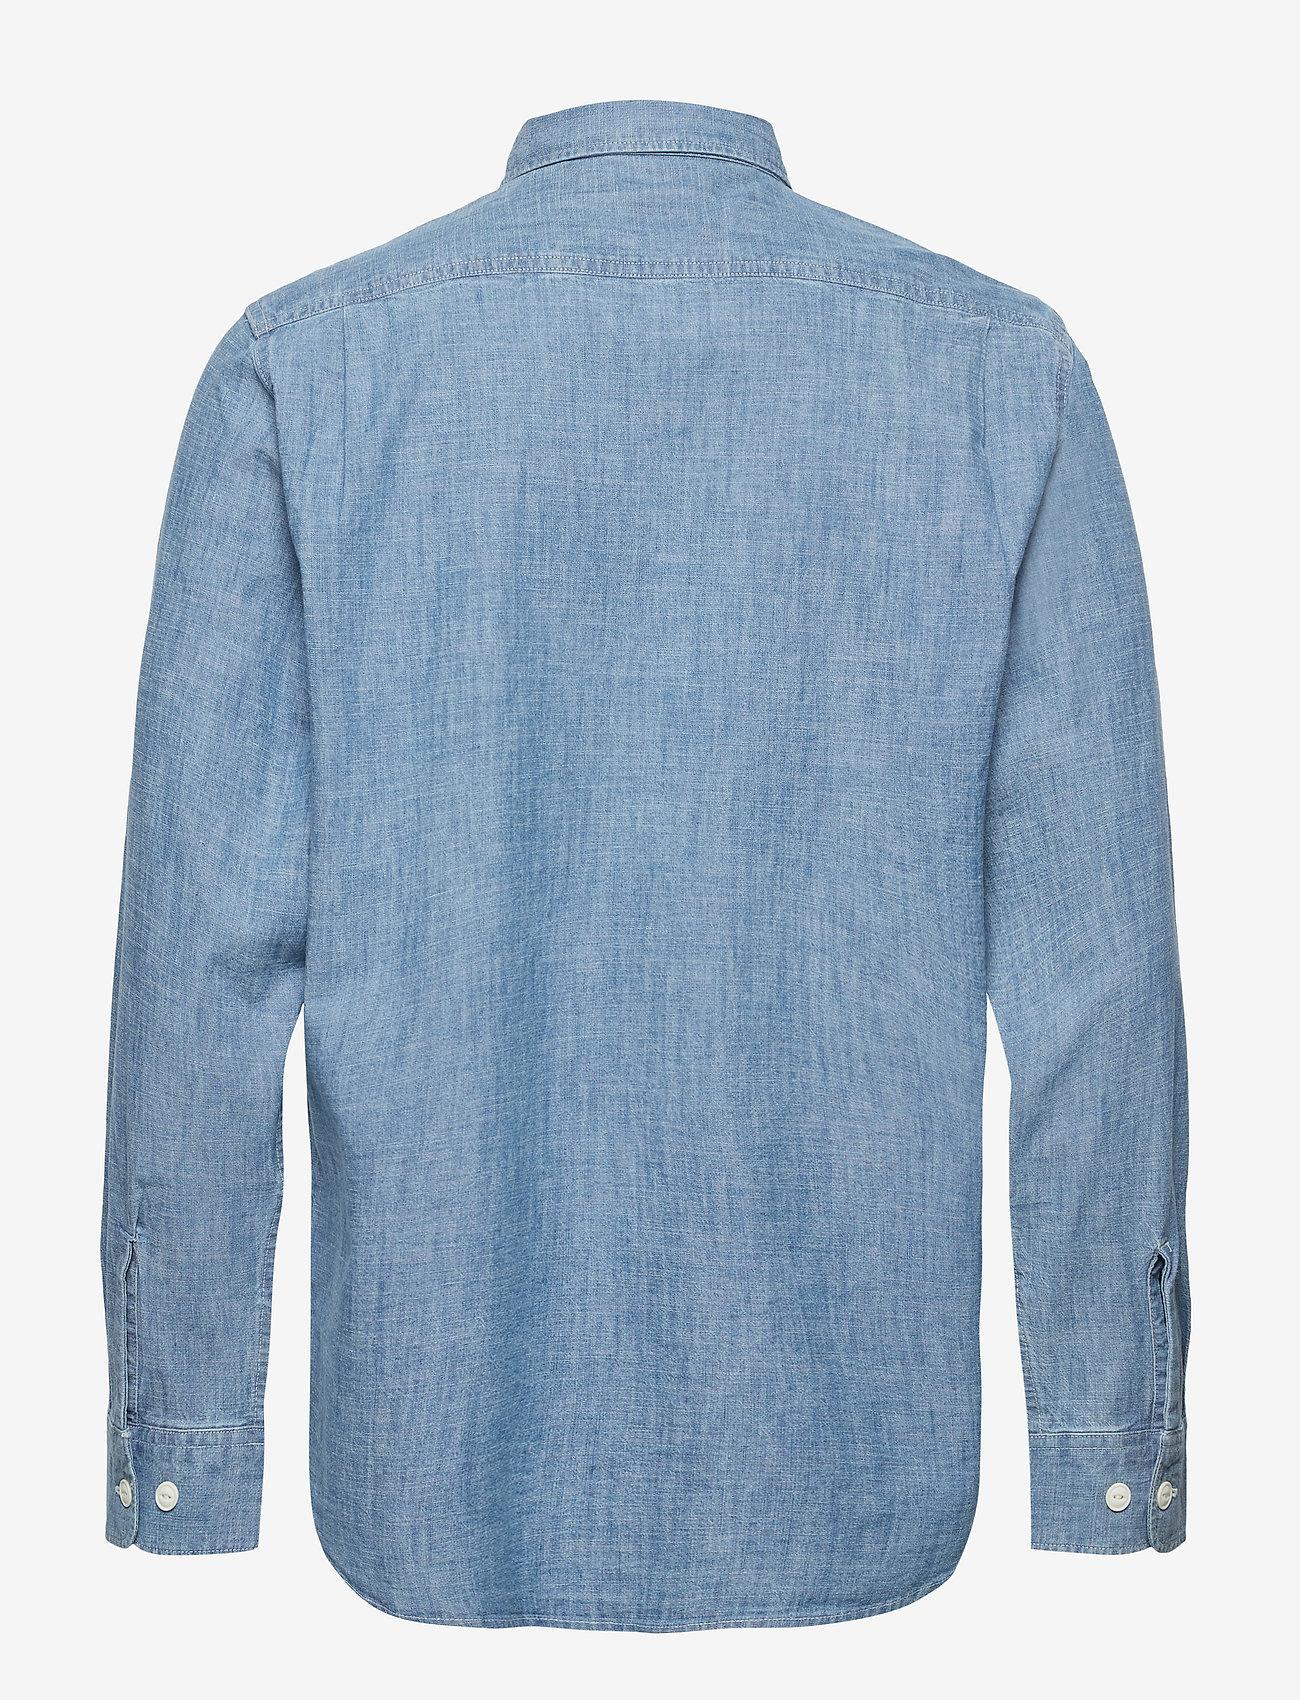 Lee Jeans SEASONAL WORKER- Chemises 9VWFZj3s La26w PPvwcz2Y